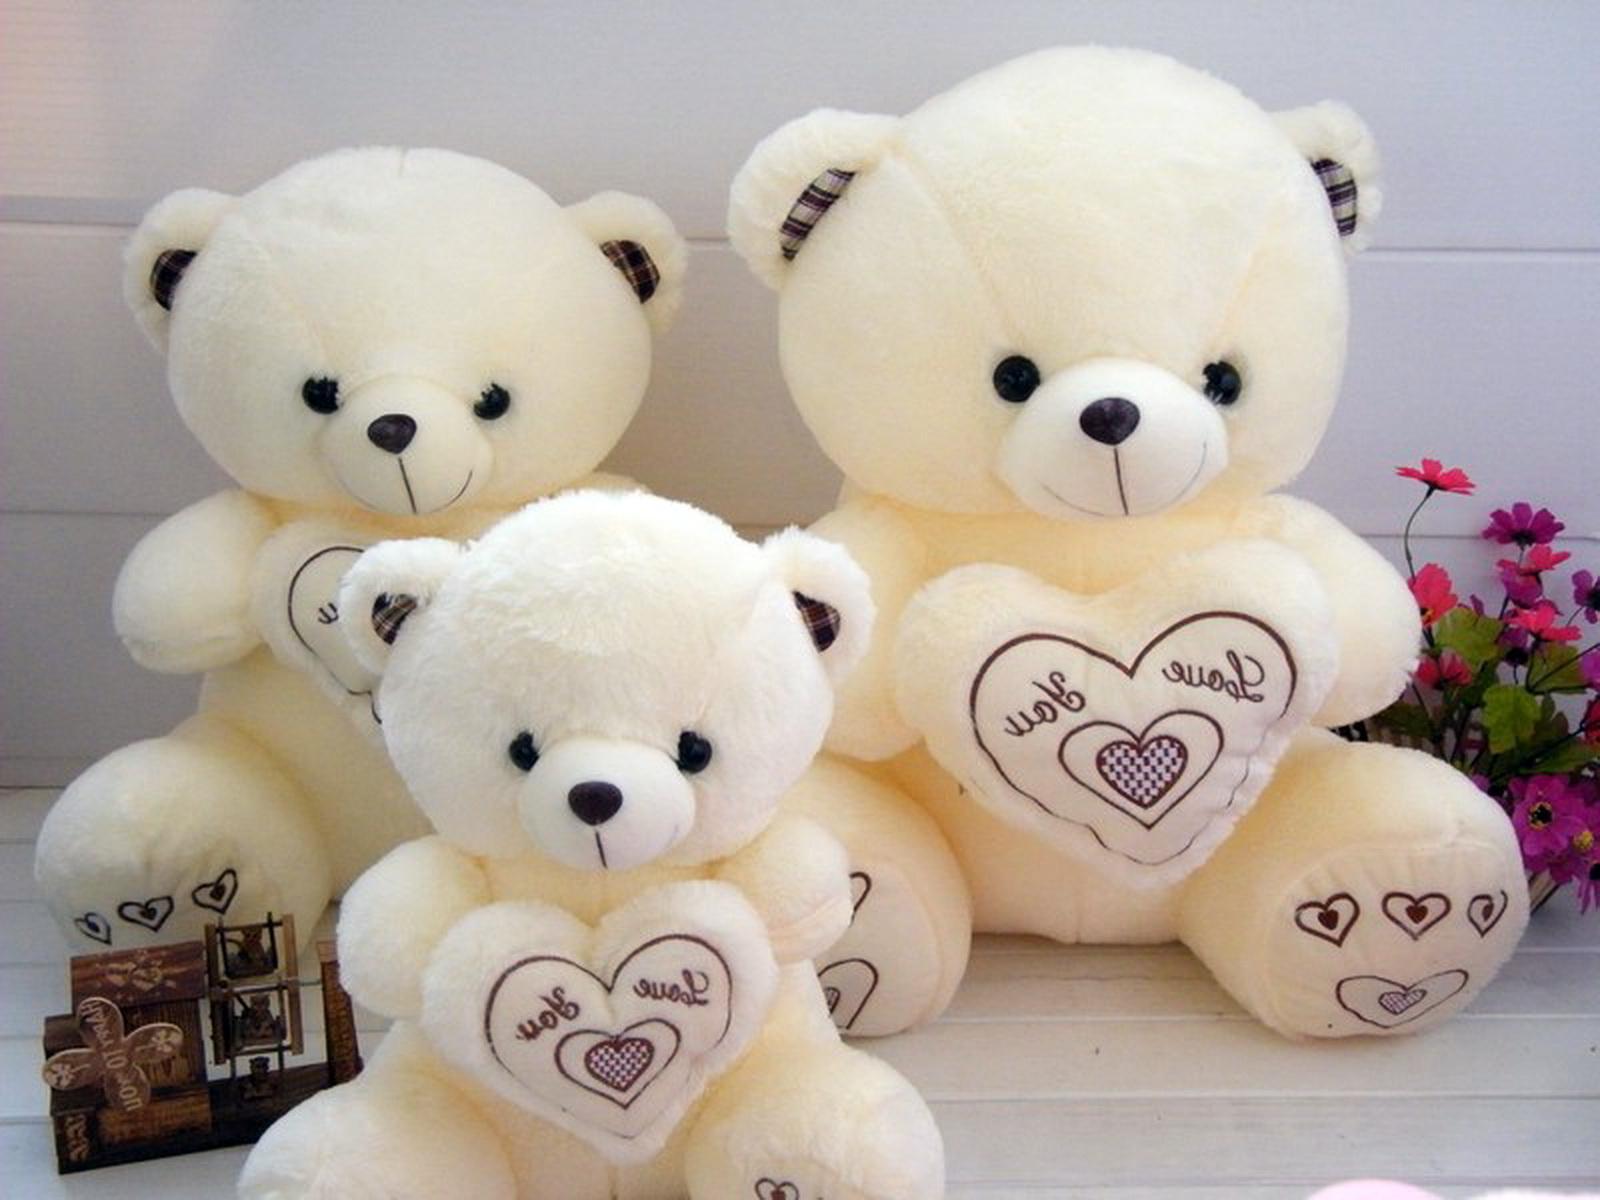 Tiny teddy bear wallpapers wallpaper cave - Free teddy bear pics ...